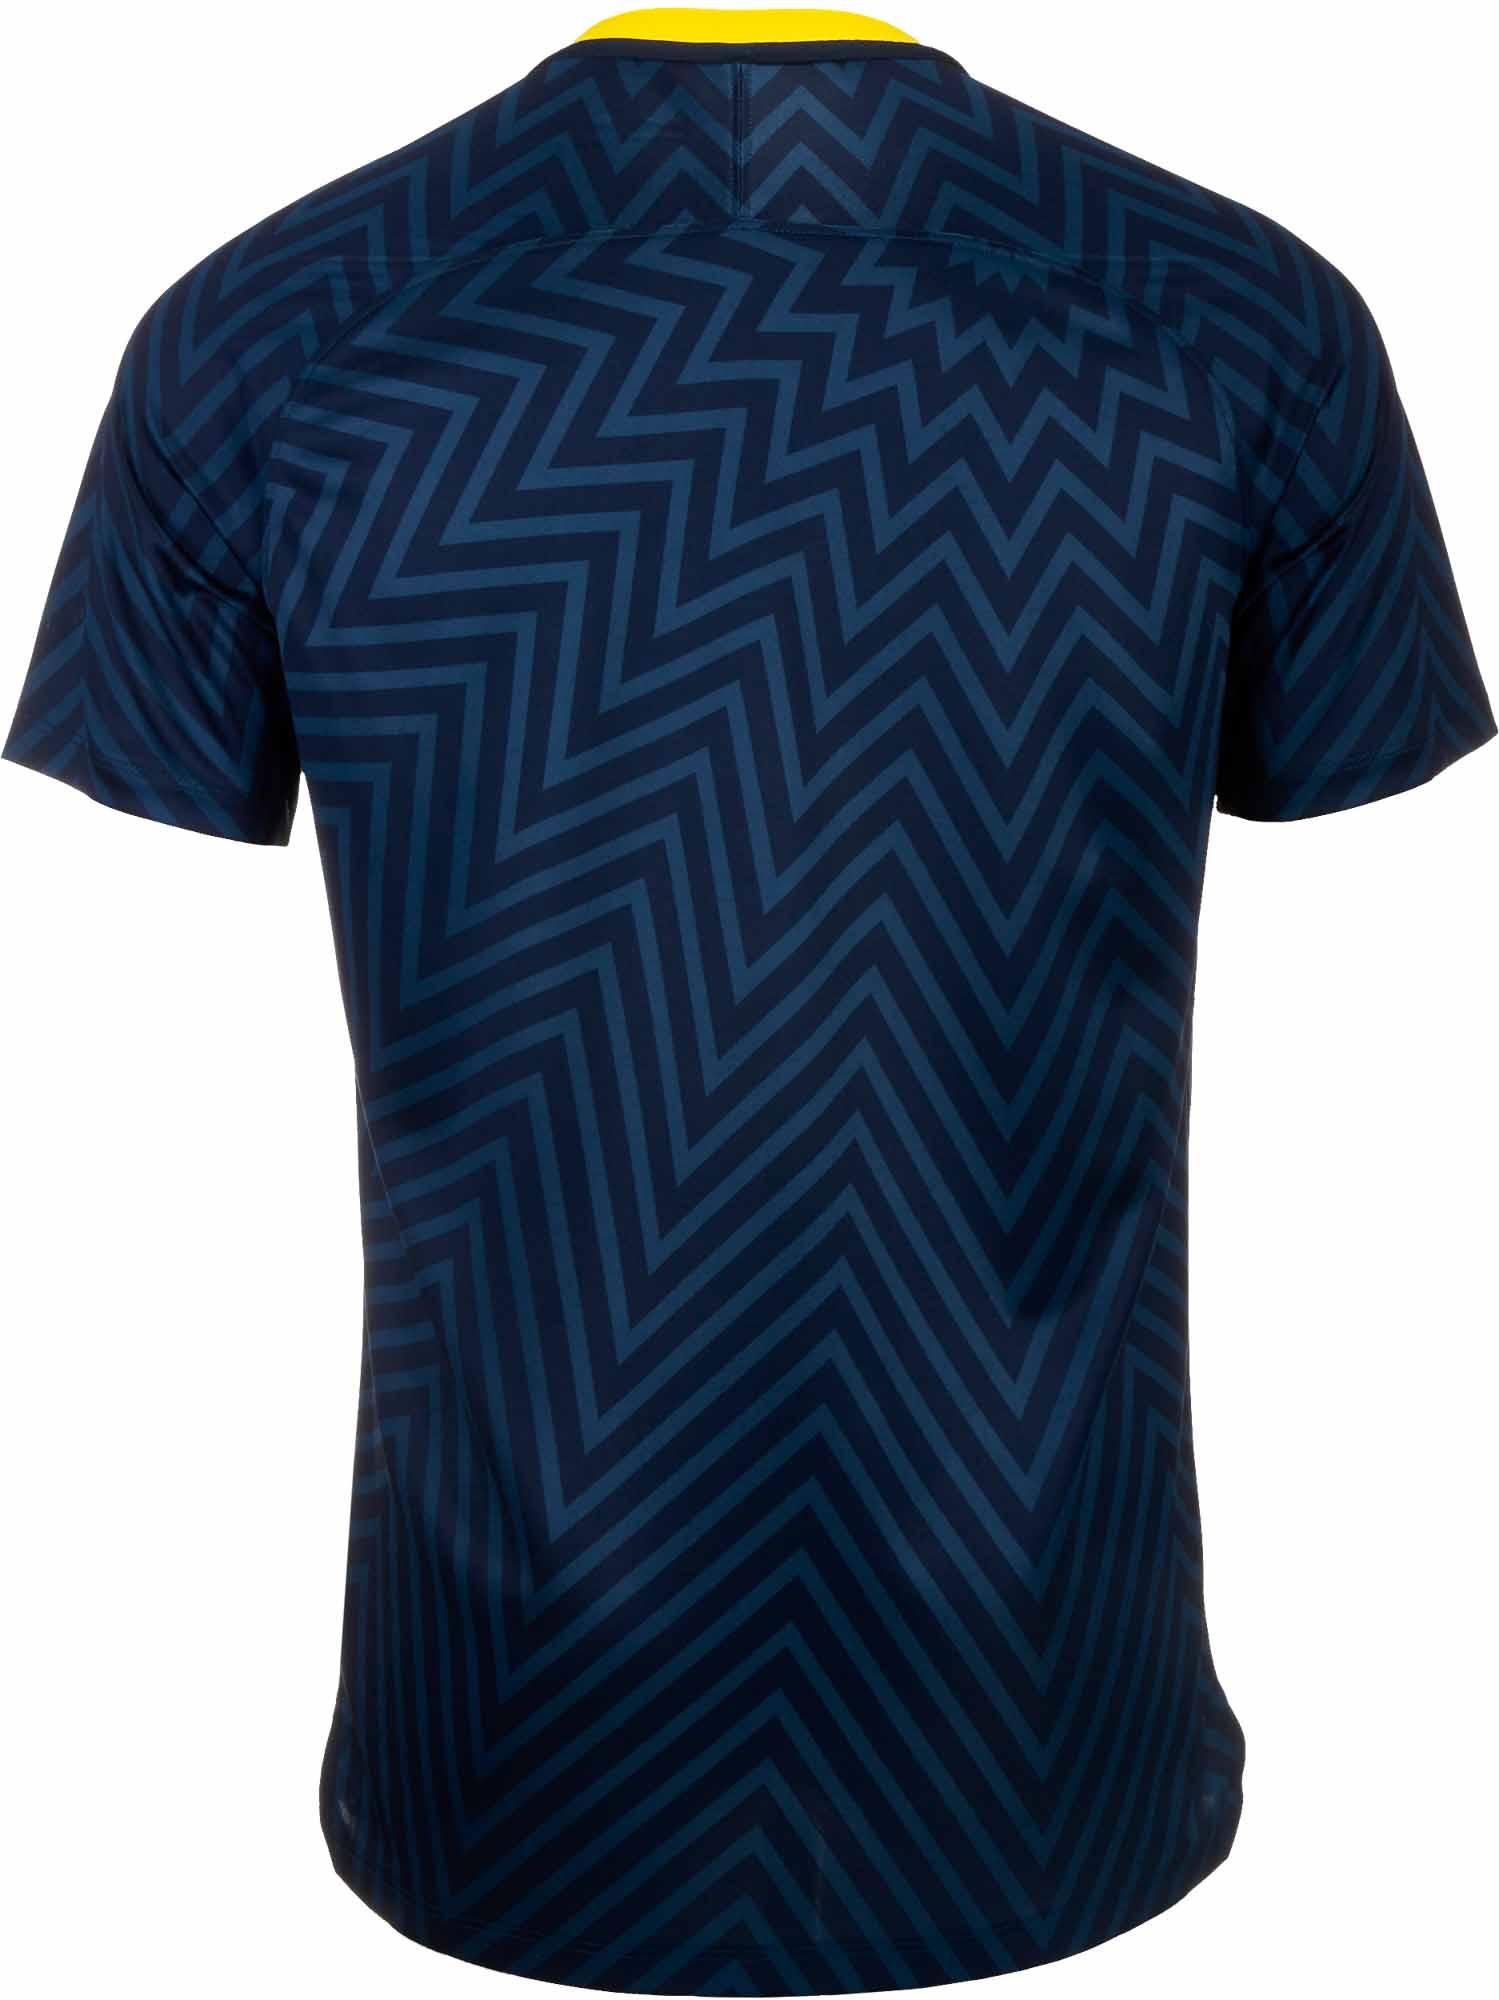 sale retailer a7c13 05cb3 Nike Brazil Pre-Match Jersey – Youth 2018-19